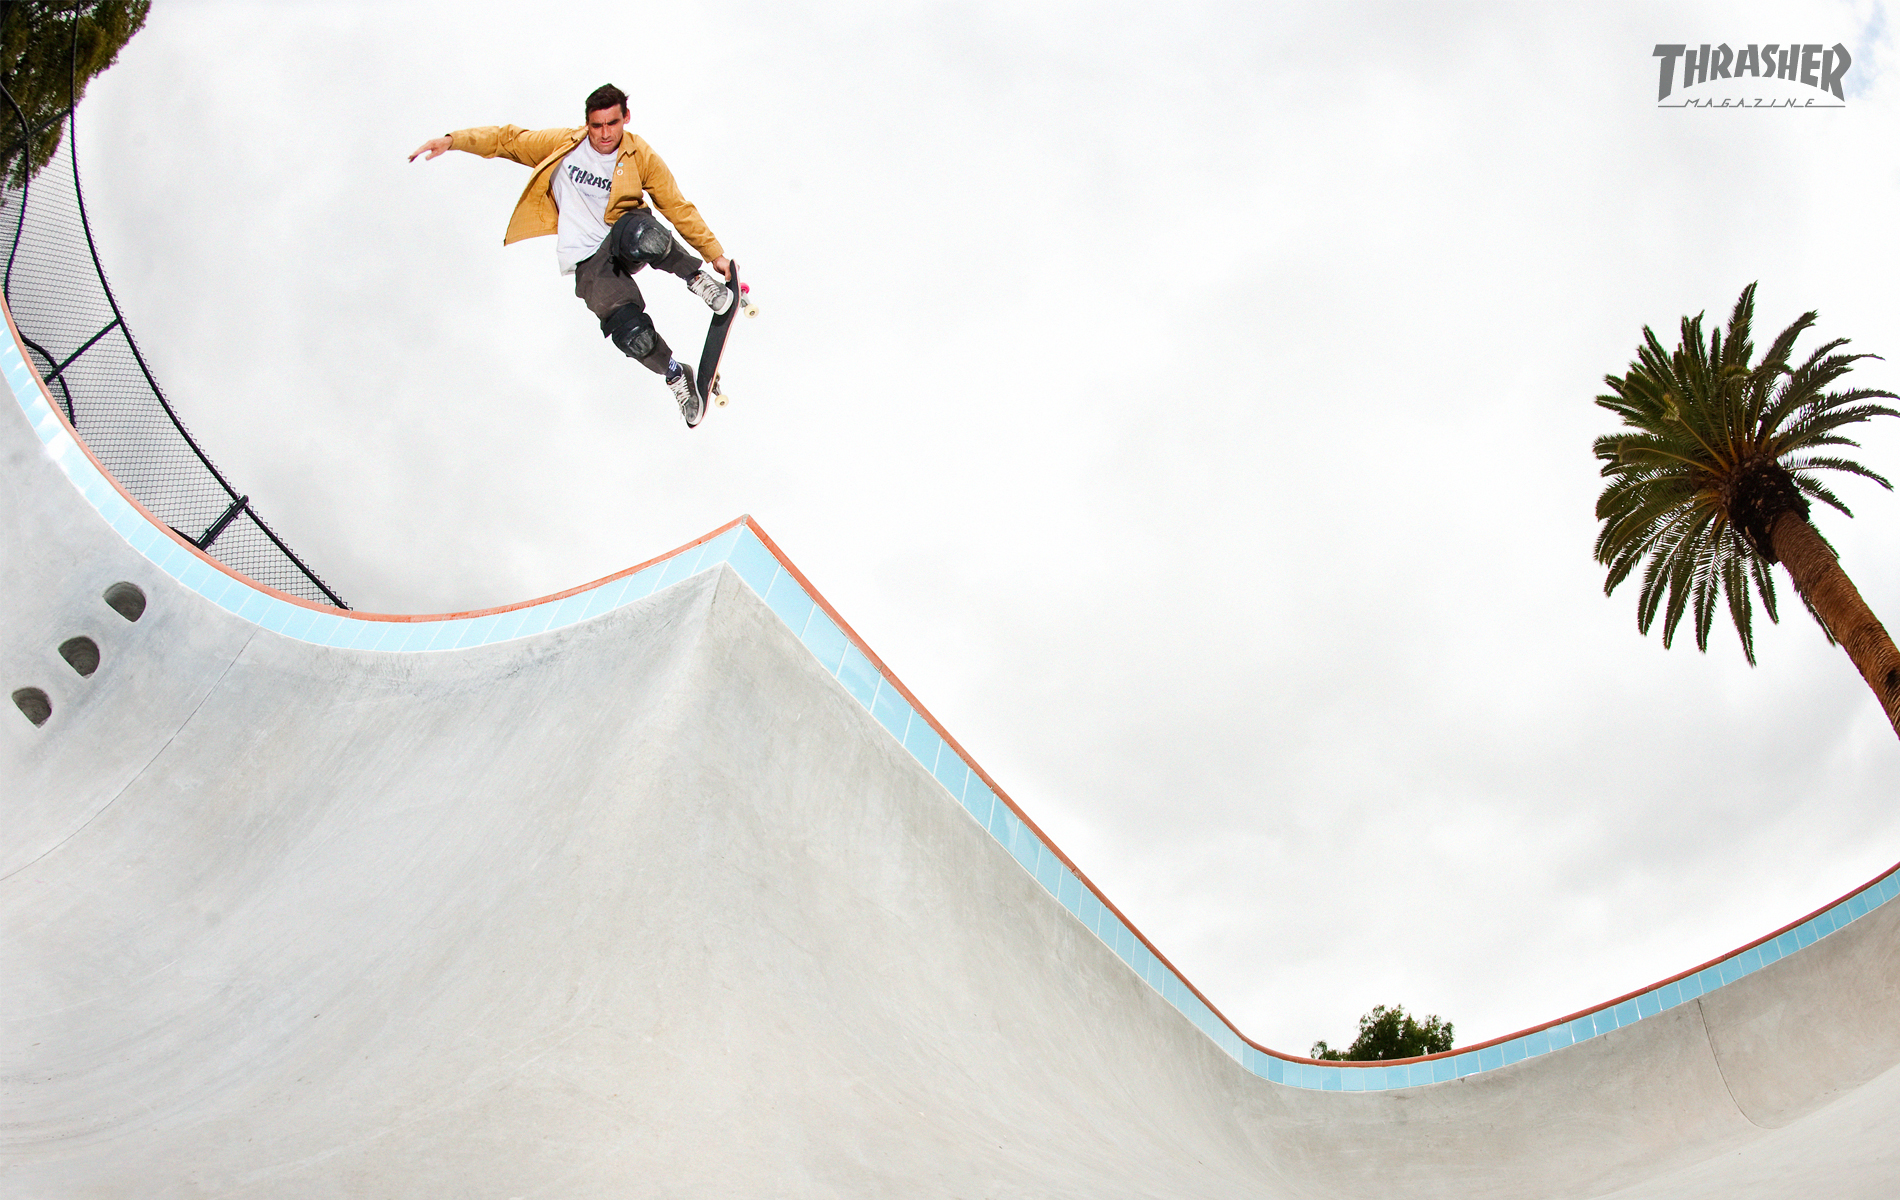 Thrasher Skateboarding Wallpaper HD Wallpaper Area HD Wallpapers 1900x1200